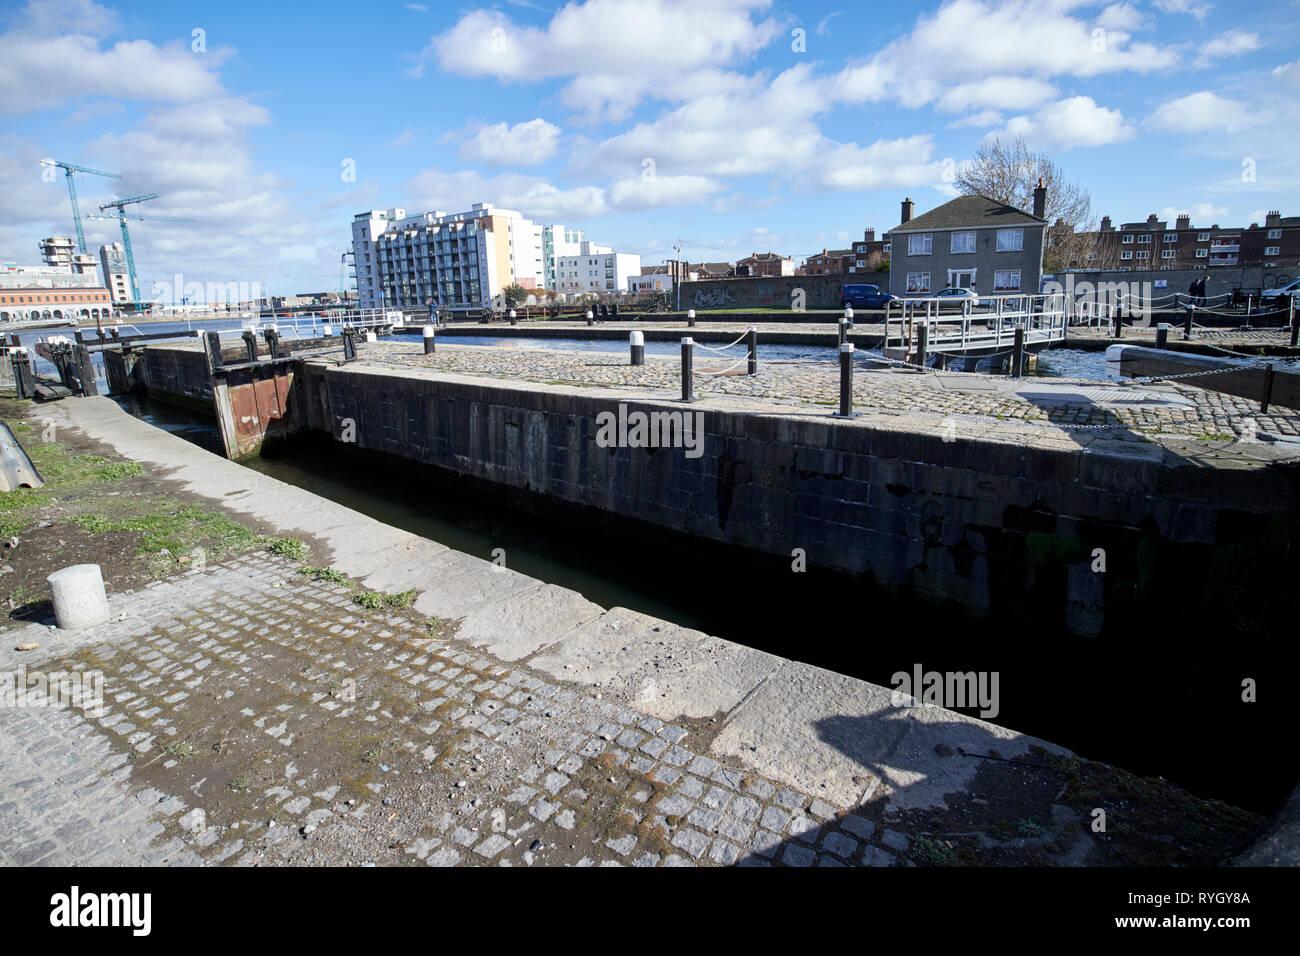 Westmoreland Lock built in 1796 Buckingham Lock and Camden Lock  part of the grand canal docks lock gates Dublin Republic of Ireland Europe - Stock Image